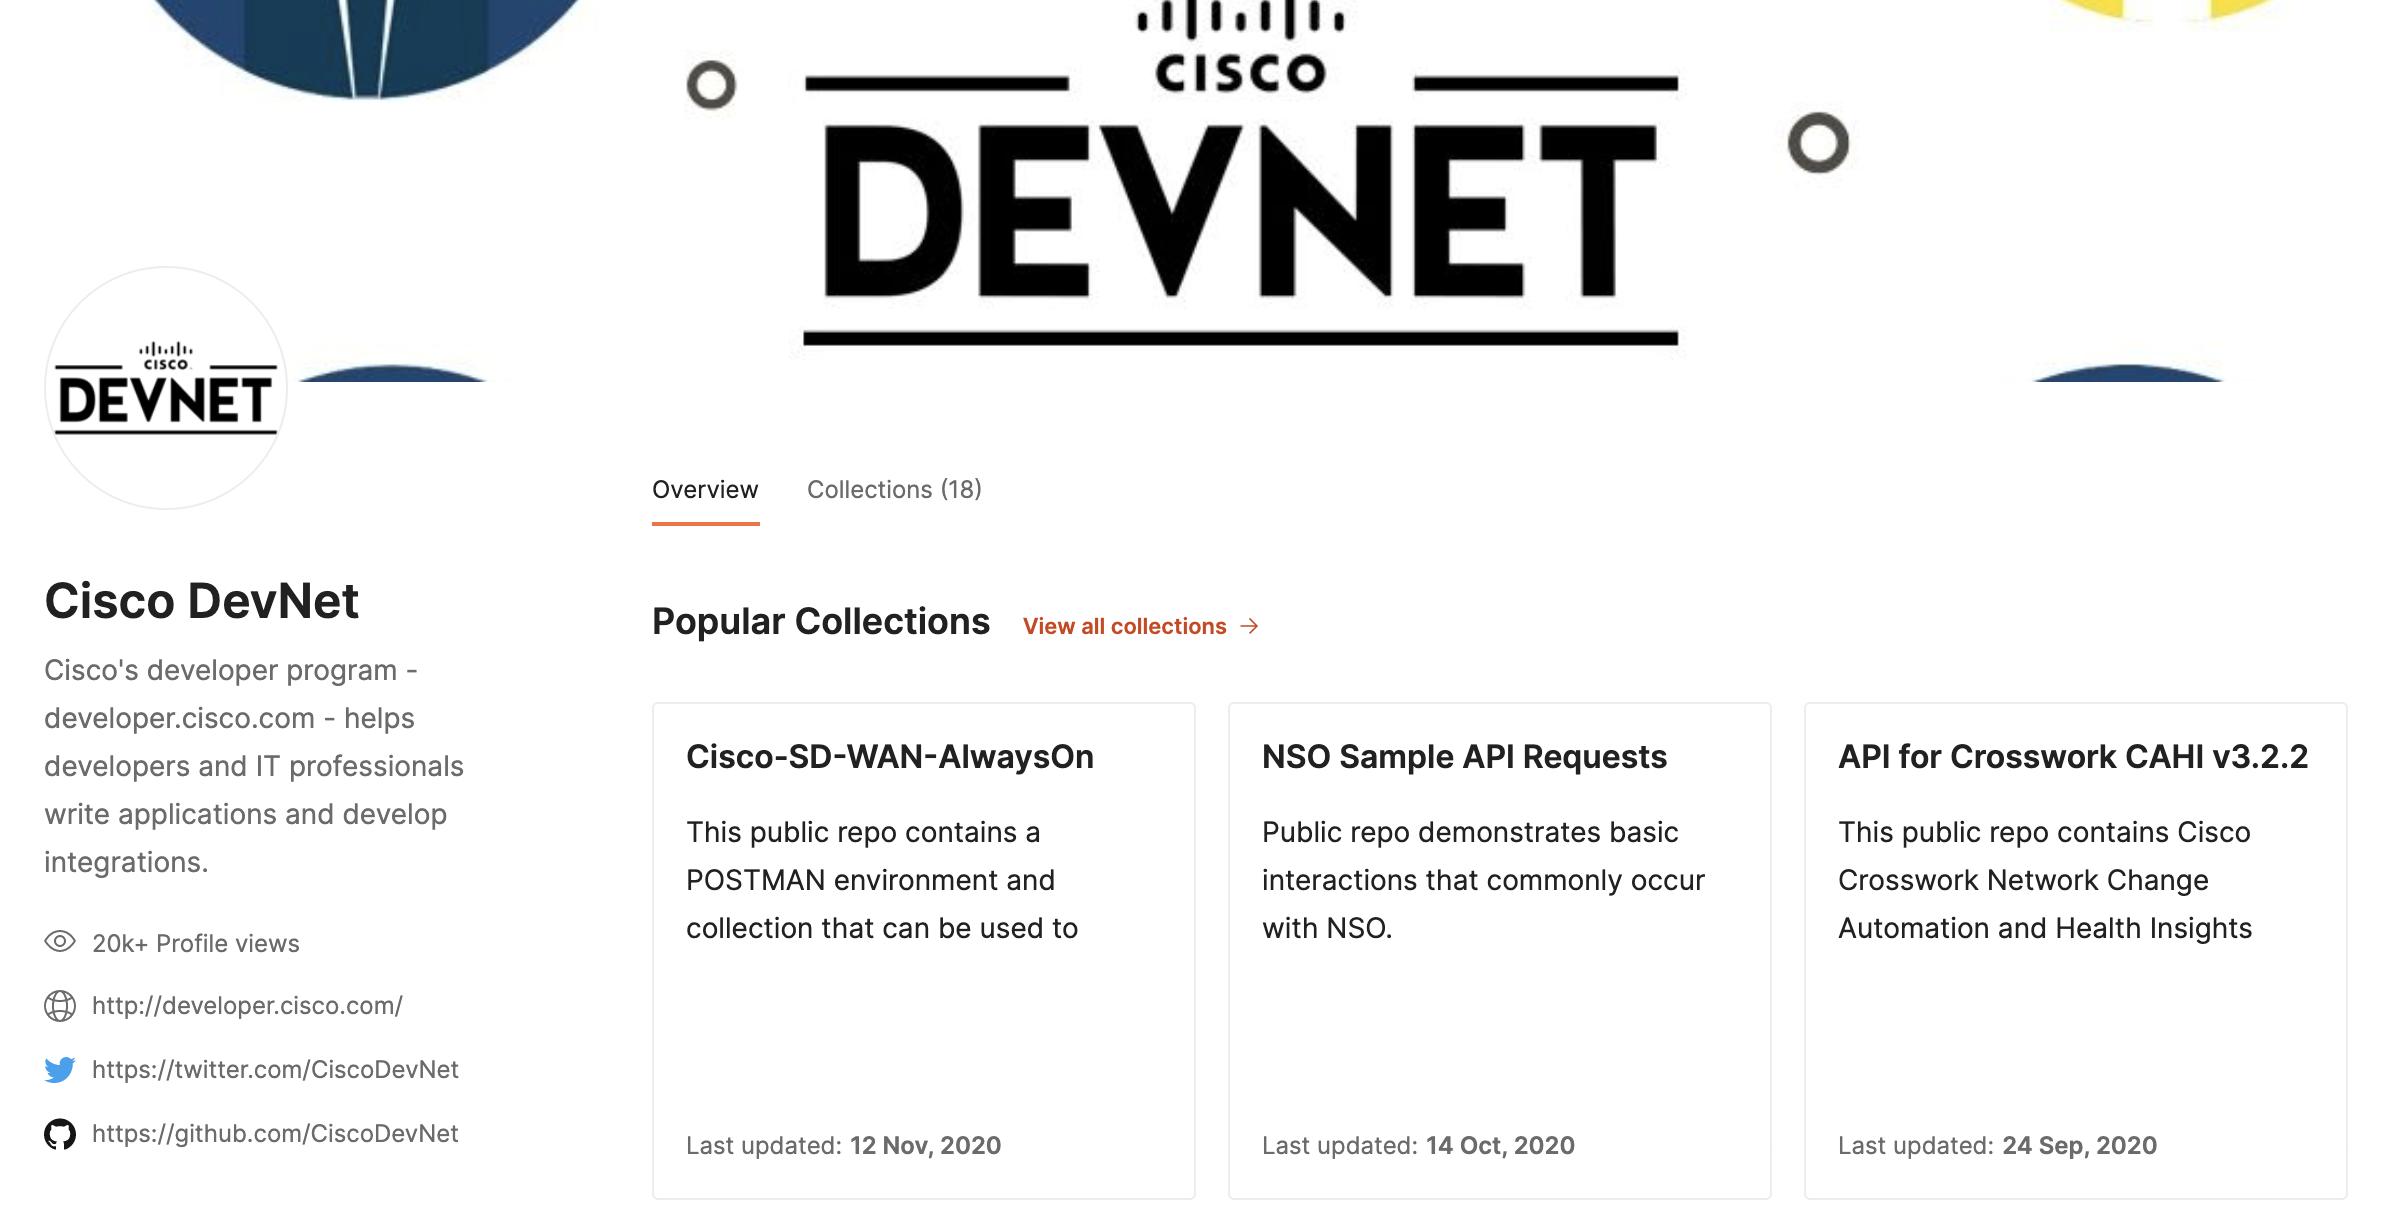 Cisco DevNet Operates Interactive Developer Schooling on Postman